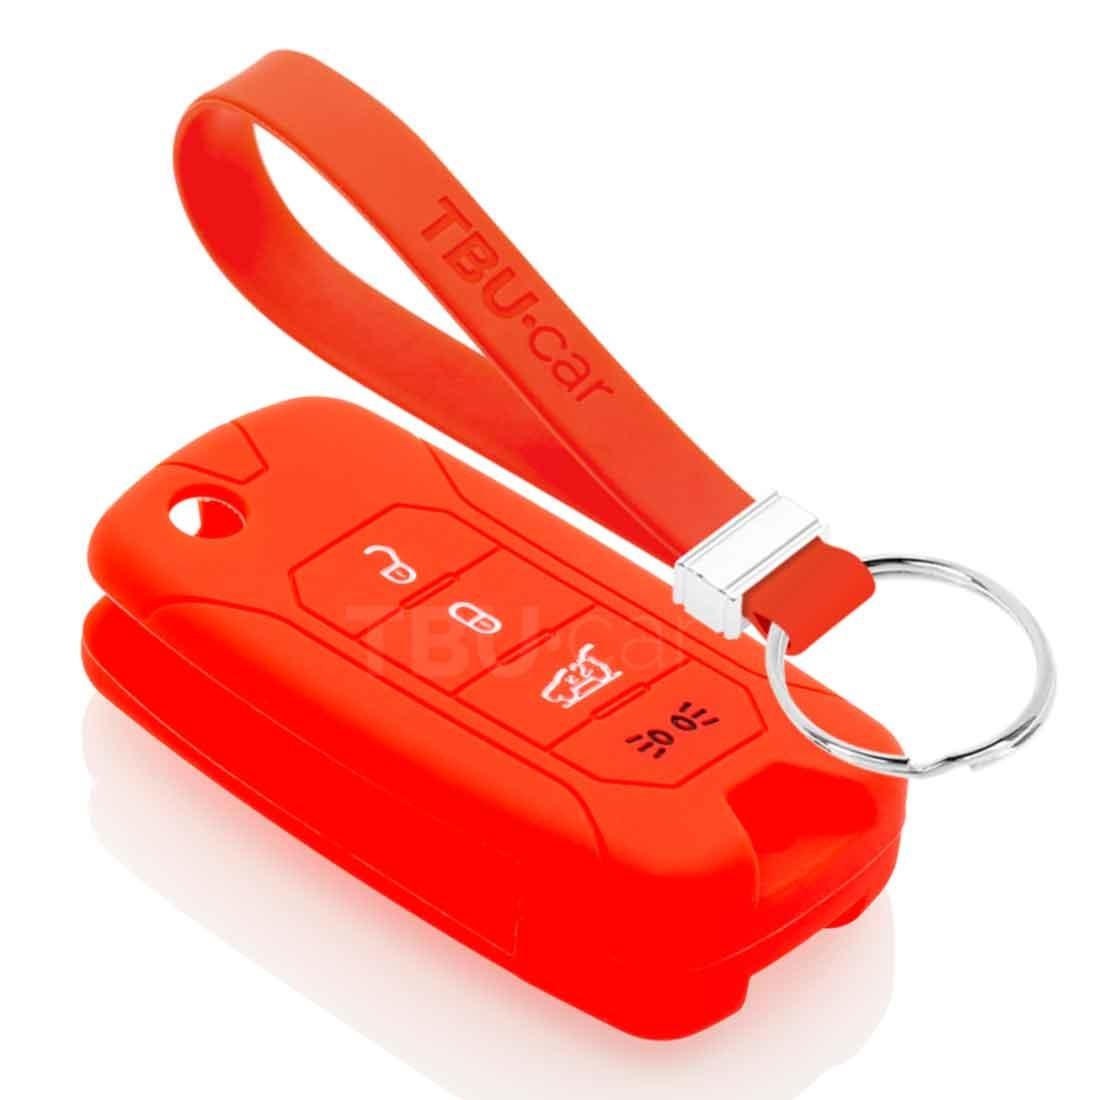 TBU car TBU car Autoschlüssel Hülle kompatibel mit Jeep 4 Tasten - Schutzhülle aus Silikon - Auto Schlüsselhülle Cover in Rot